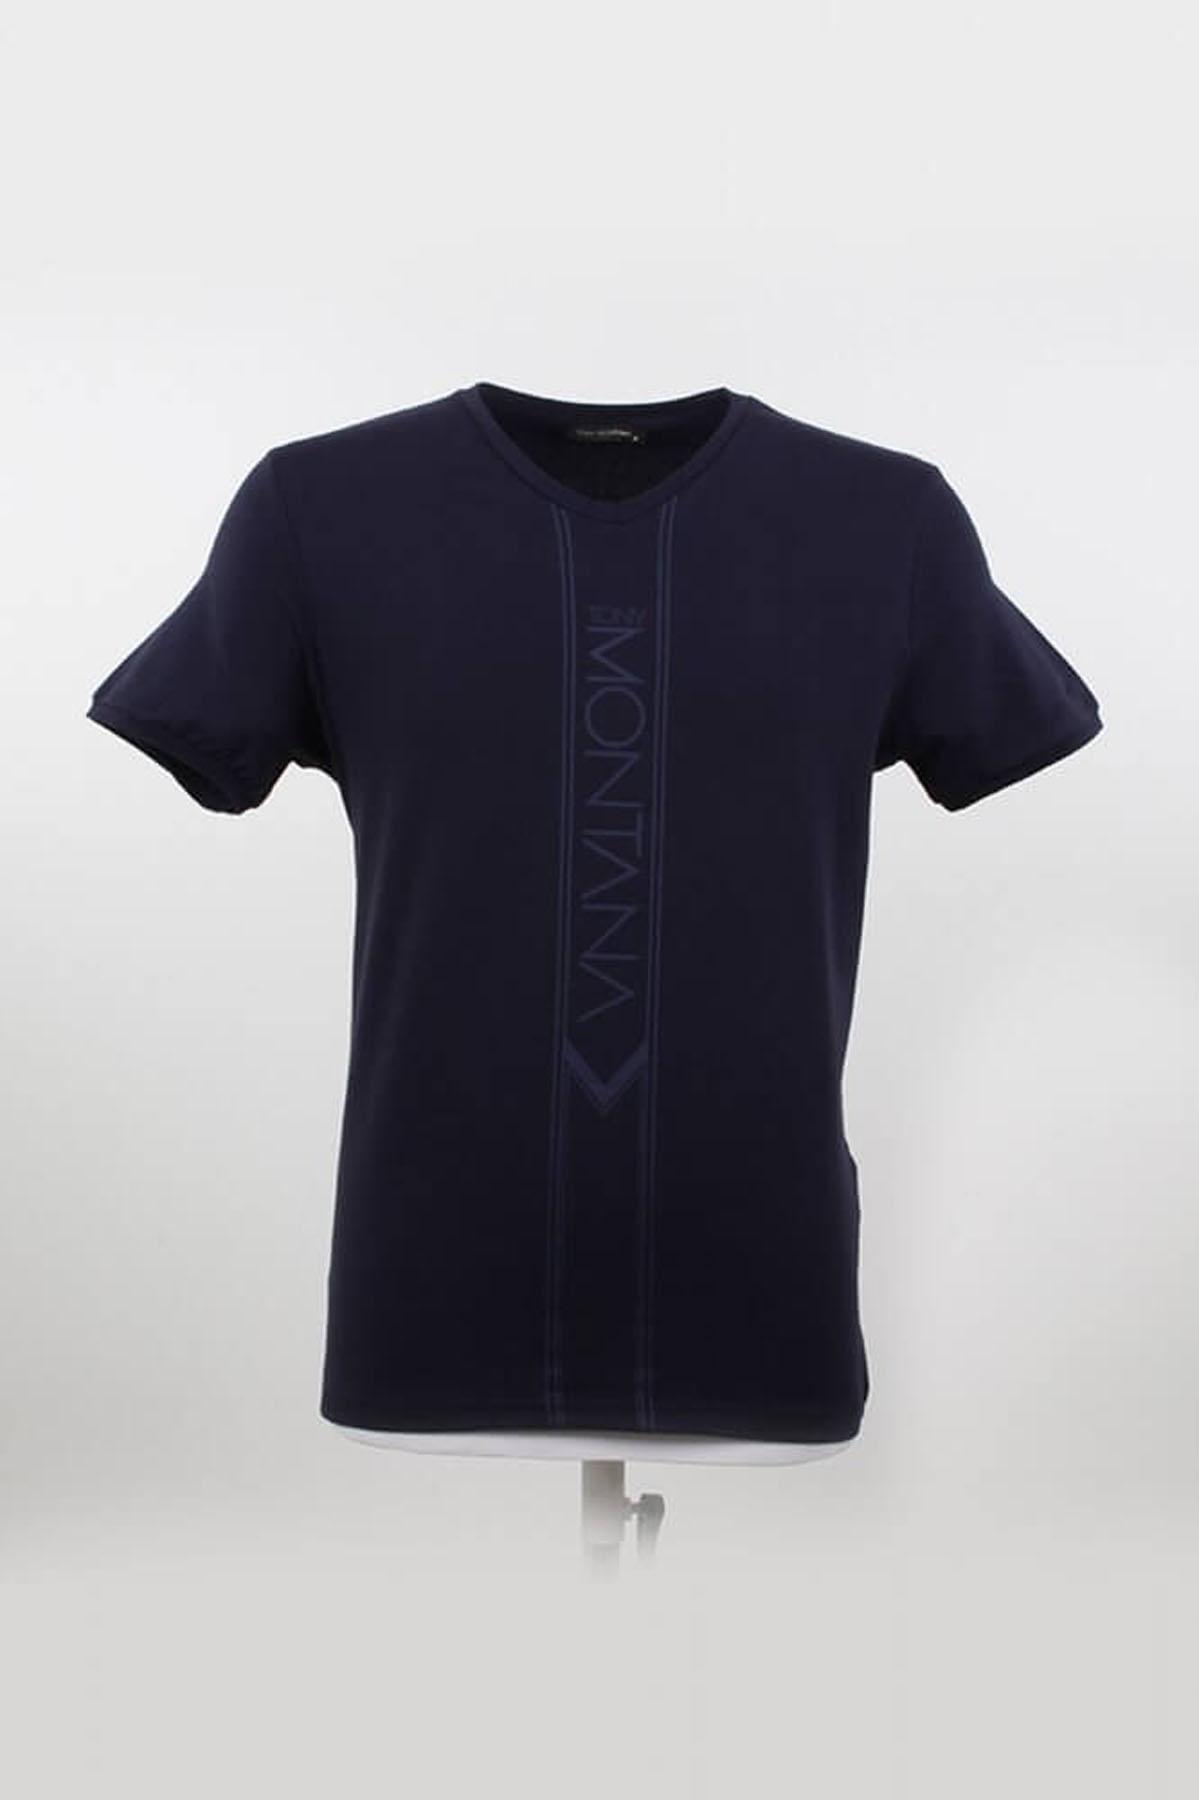 V Yaka Yazılı Lacivert T-Shirt